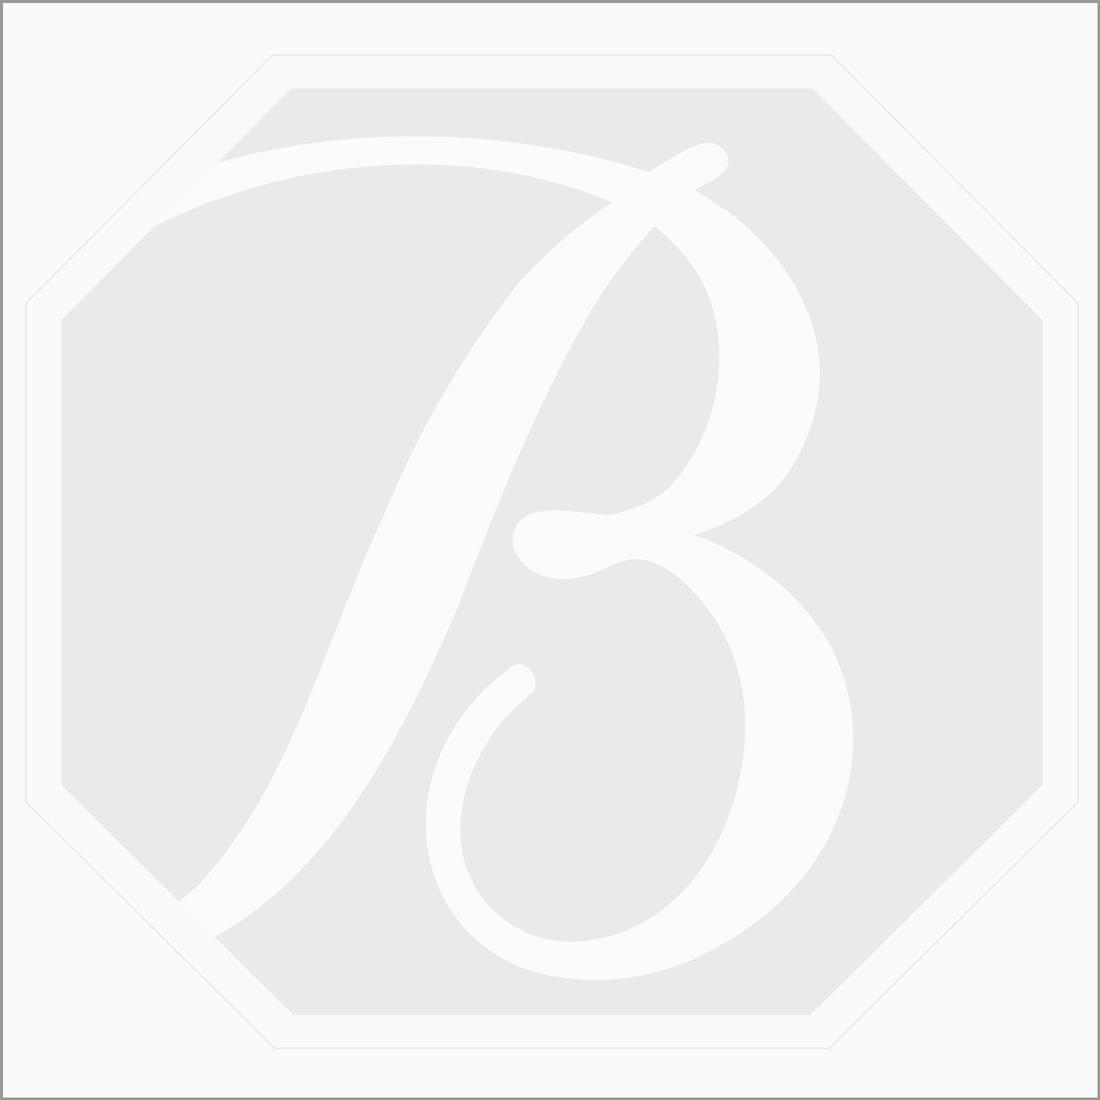 1 Black Diamond Oval Shape Rose Cut Diamonds - 10.38 cts. (DRC1256)